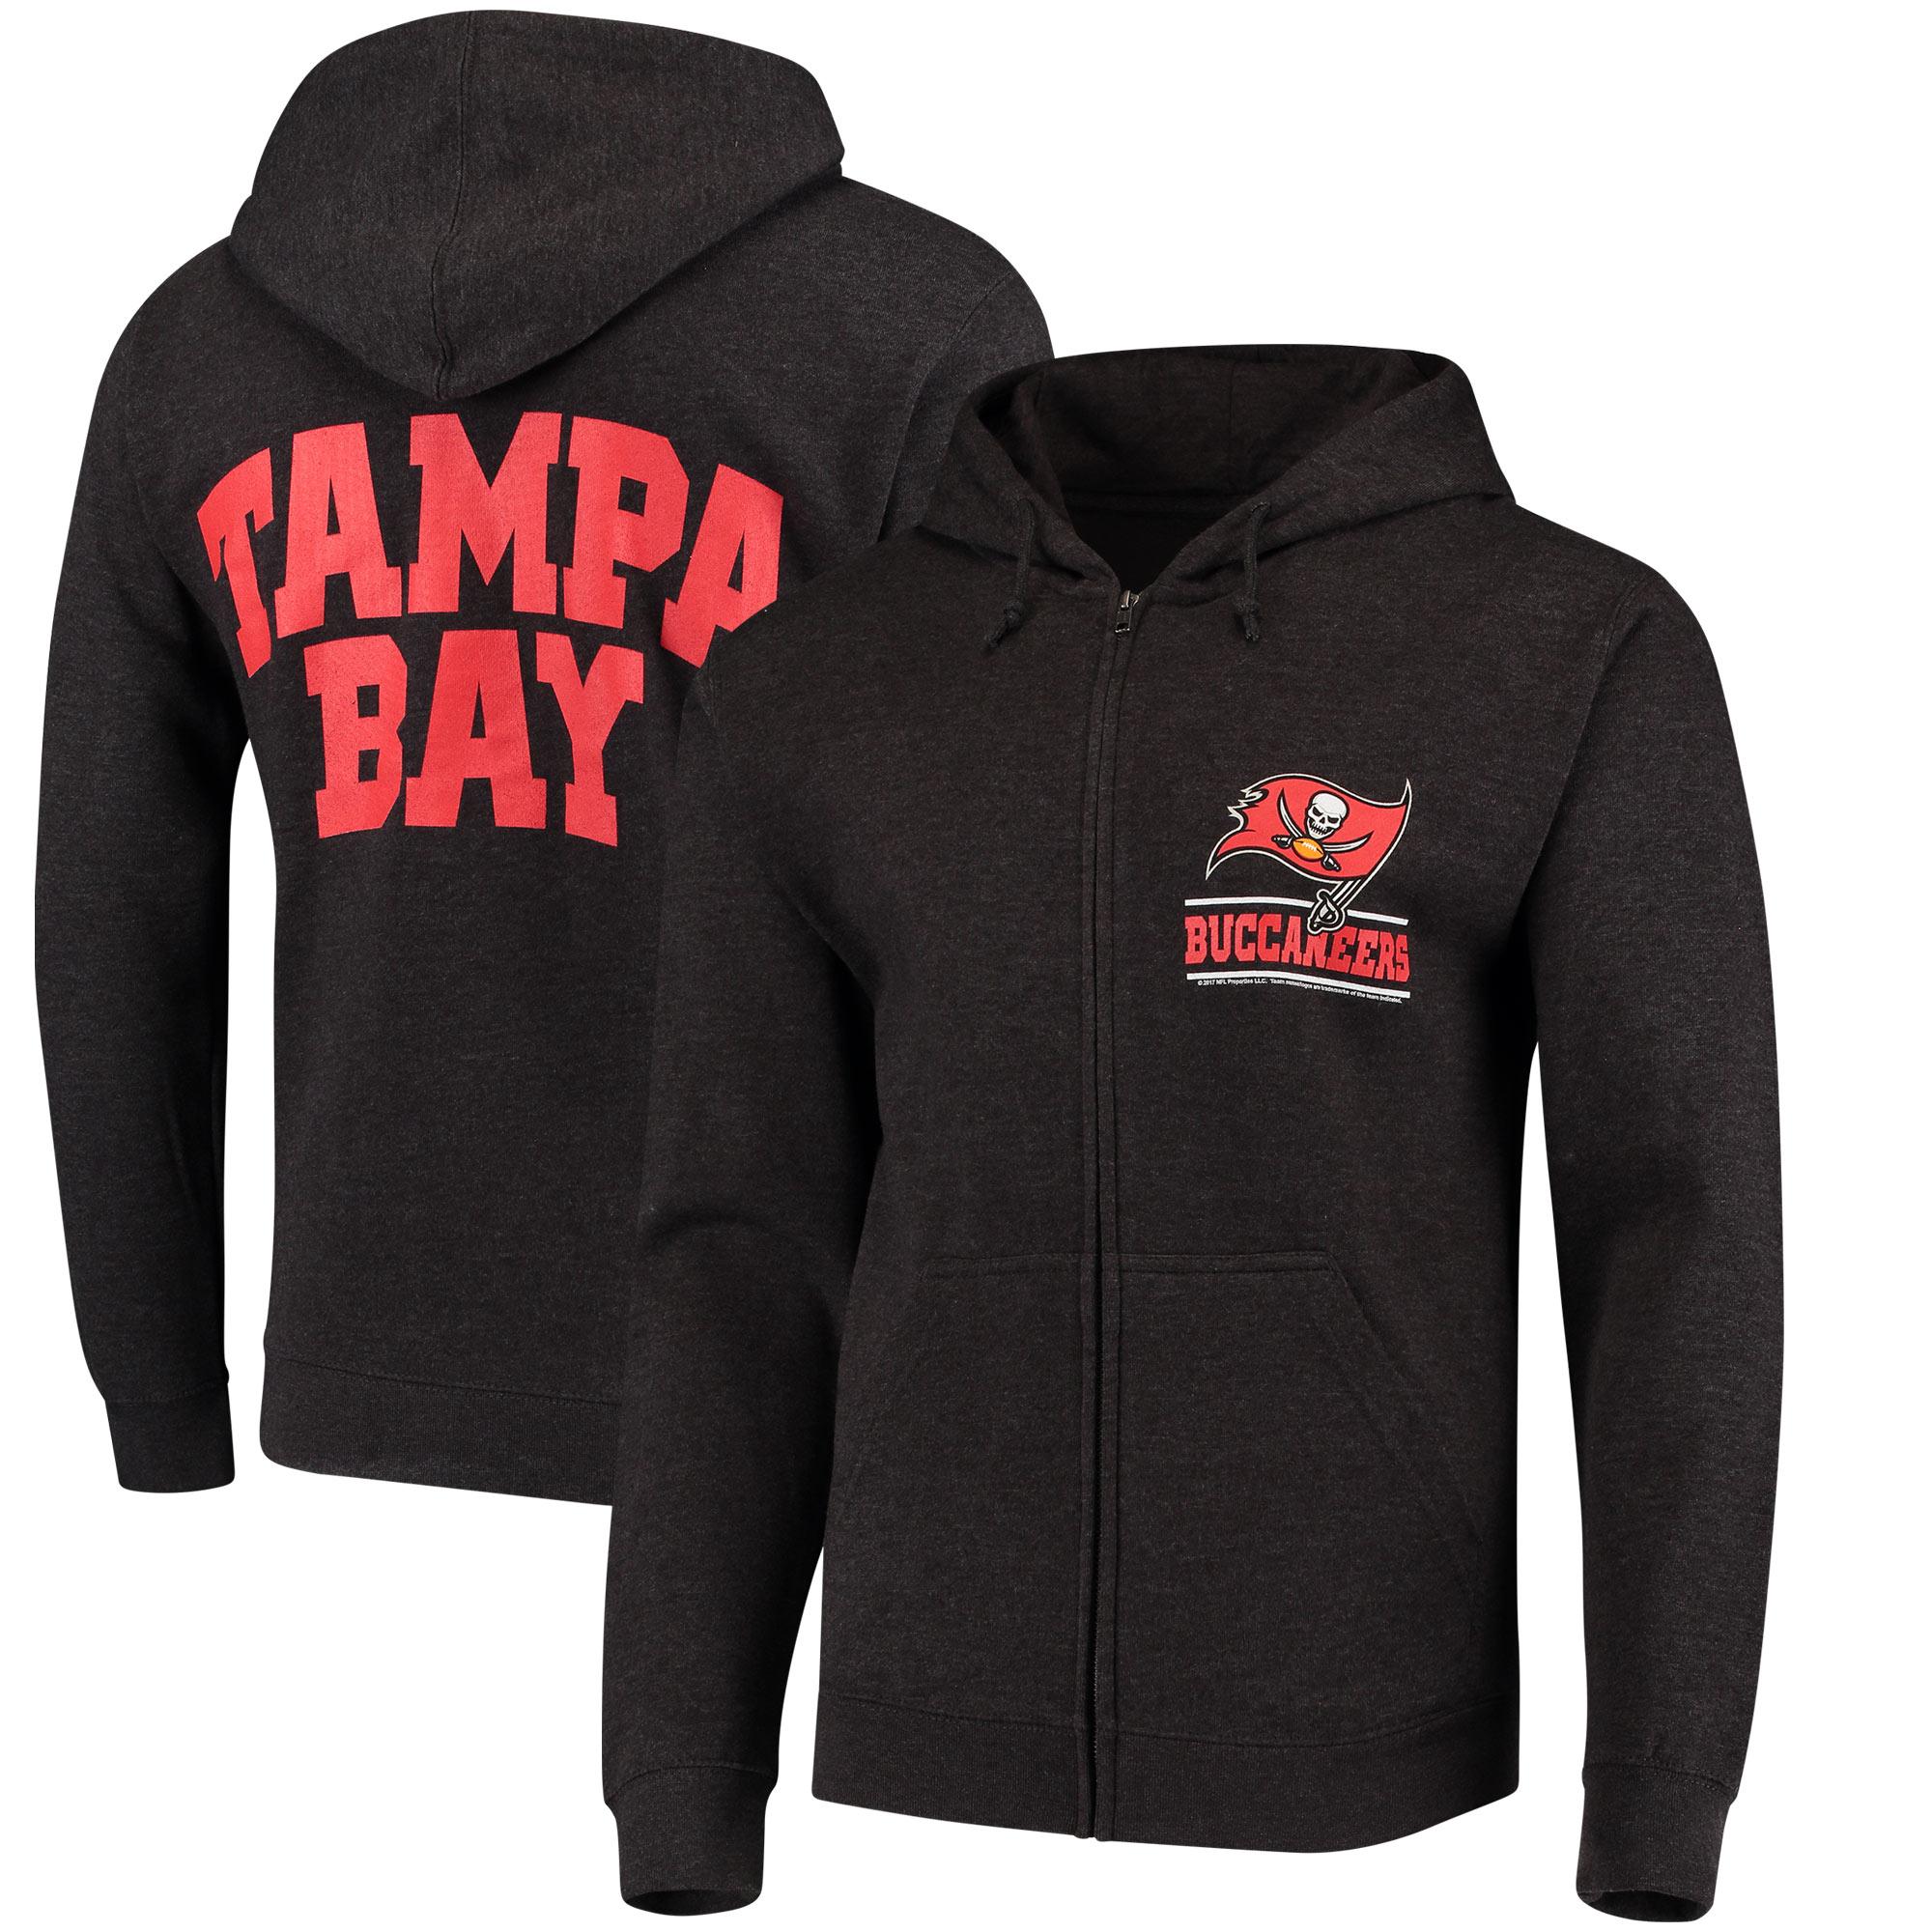 Tampa Bay Buccaneers Quarterback Full-Zip Hoodie - Heathered Charcoal